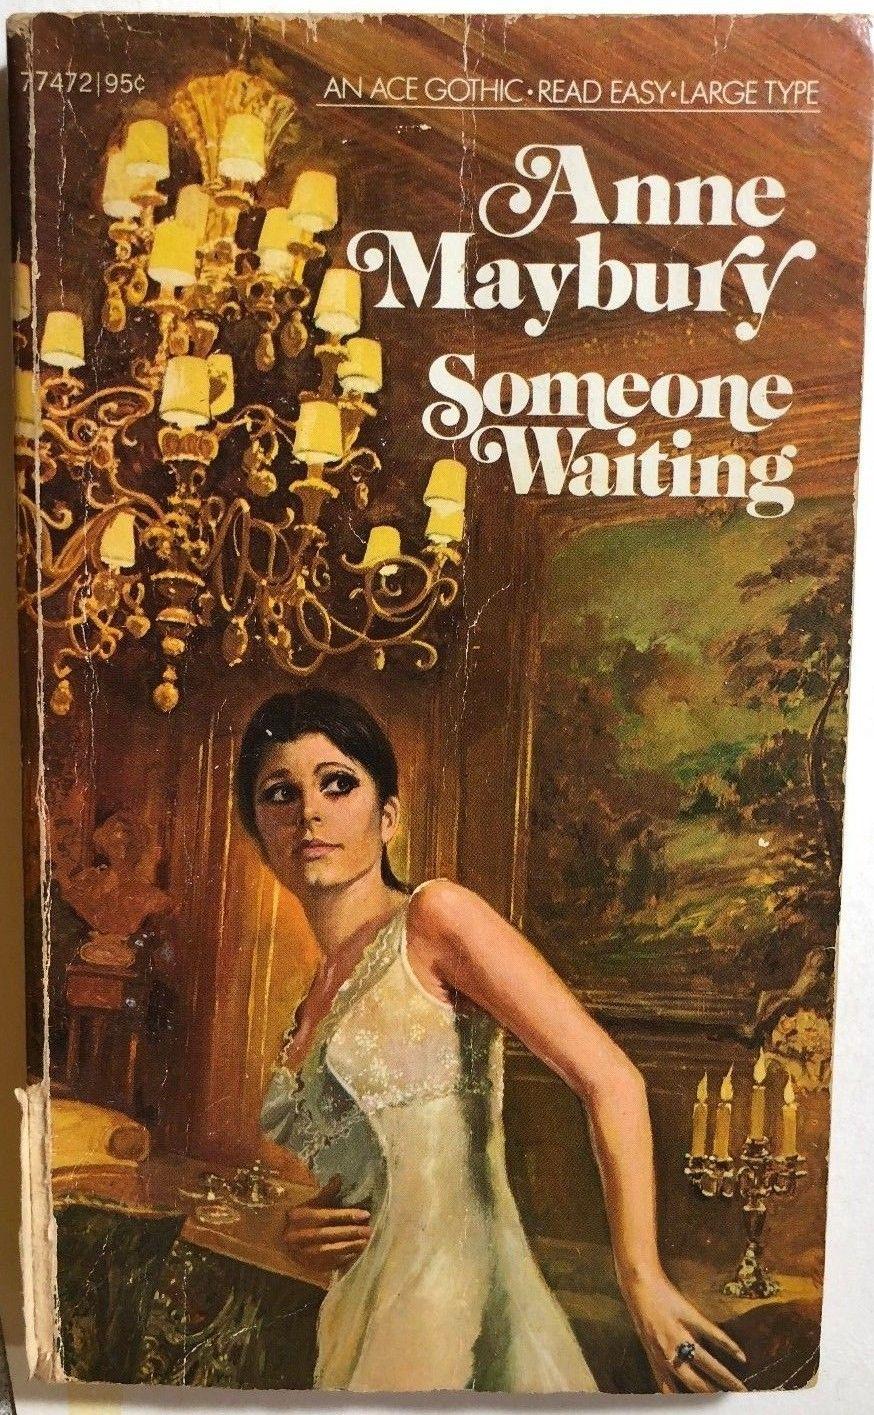 77472-9 ANNE MAYBURY (aka ANNE BUXTON) Someone Waiting (c.1961; 1966,  October 1972; 4th ACE printing; ACE Gothic Novel)